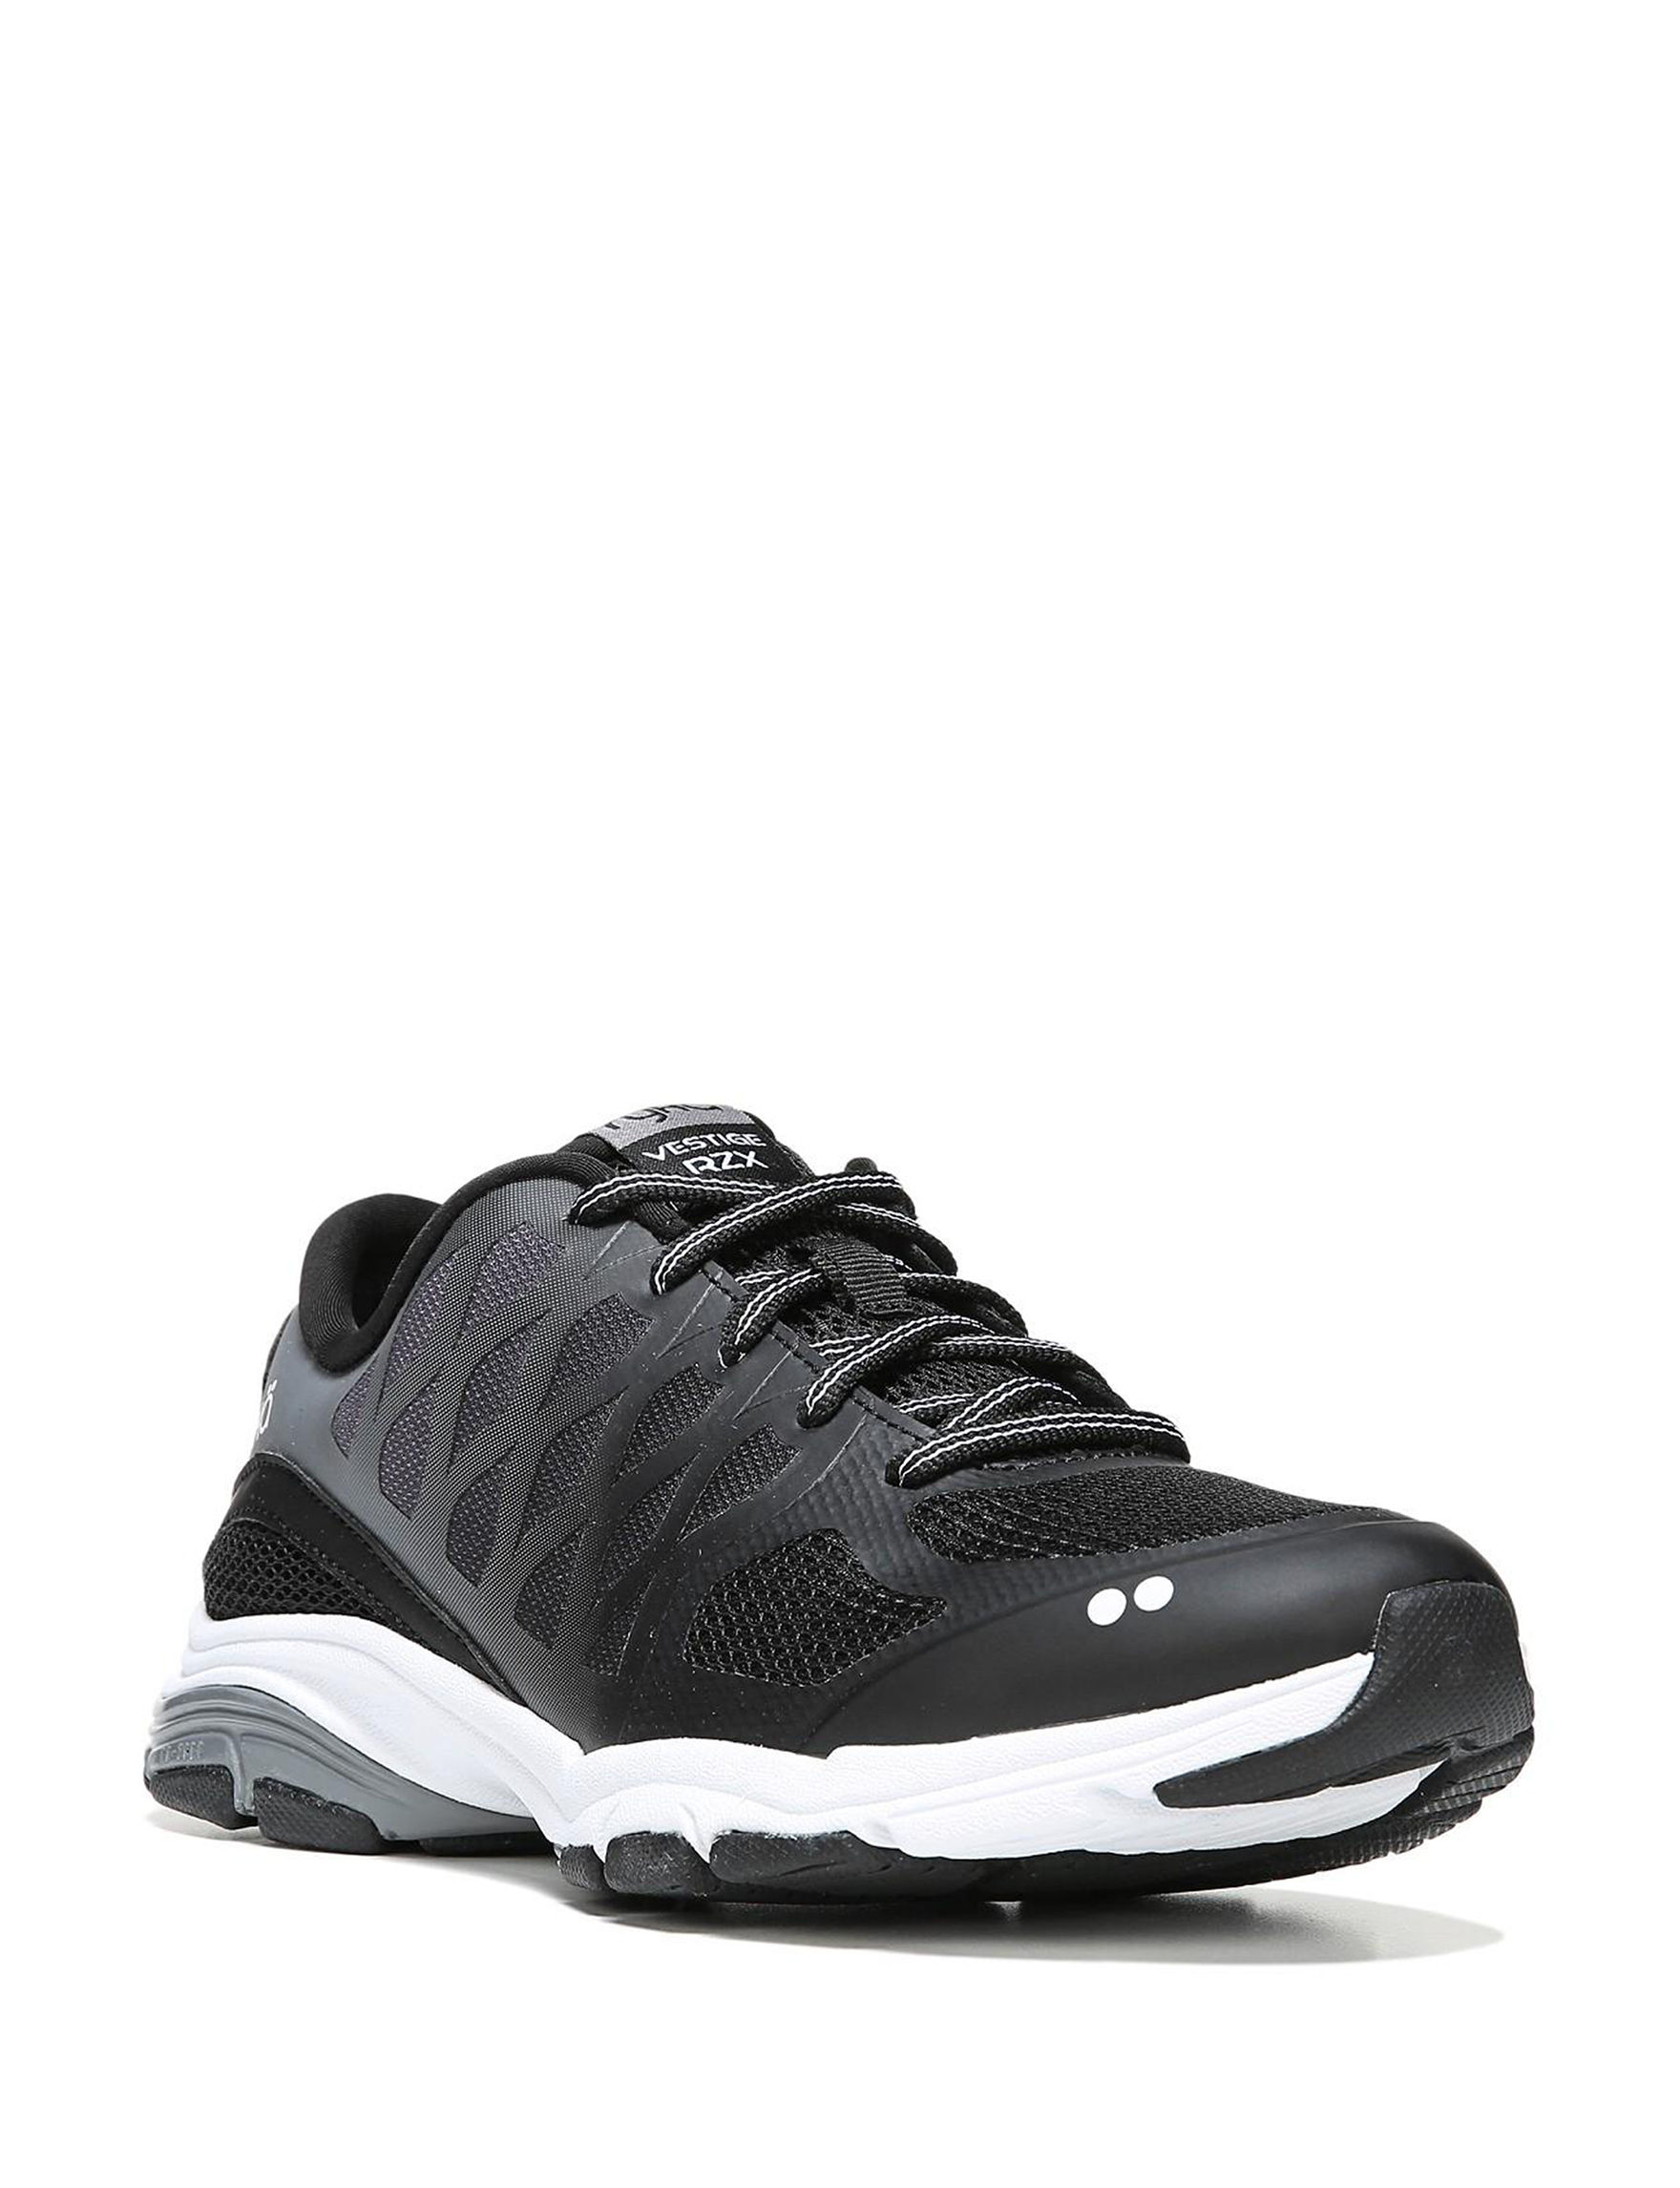 Ryka Black / White / Grey Comfort Shoes